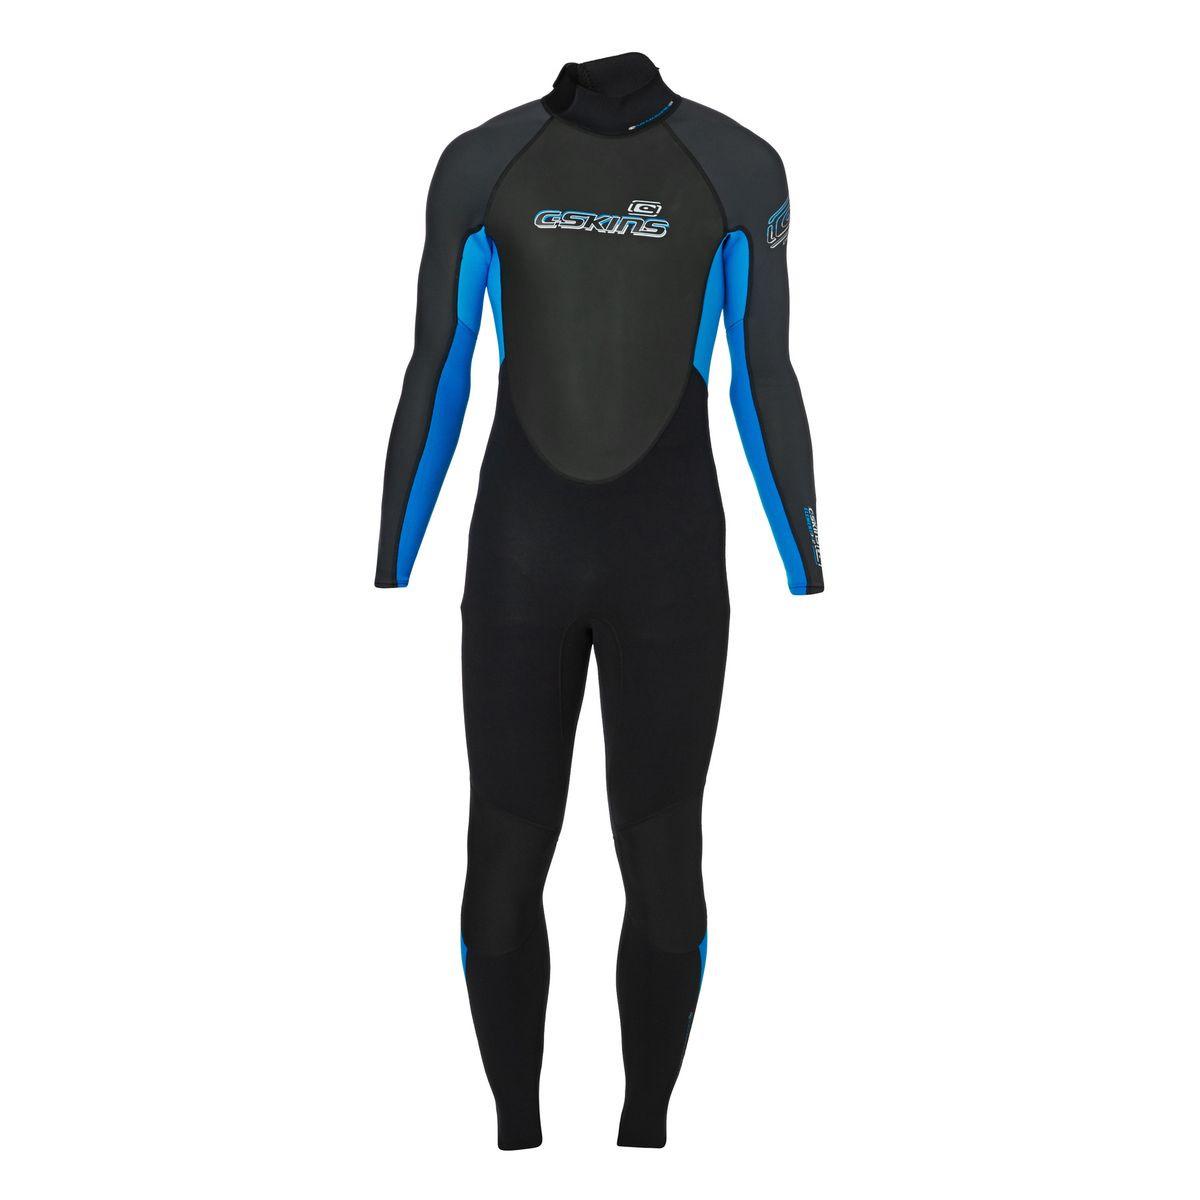 C-Skins Element 3/2mm Flatlock Back Zip Wetsuit - Black/ Blue/ Graphite